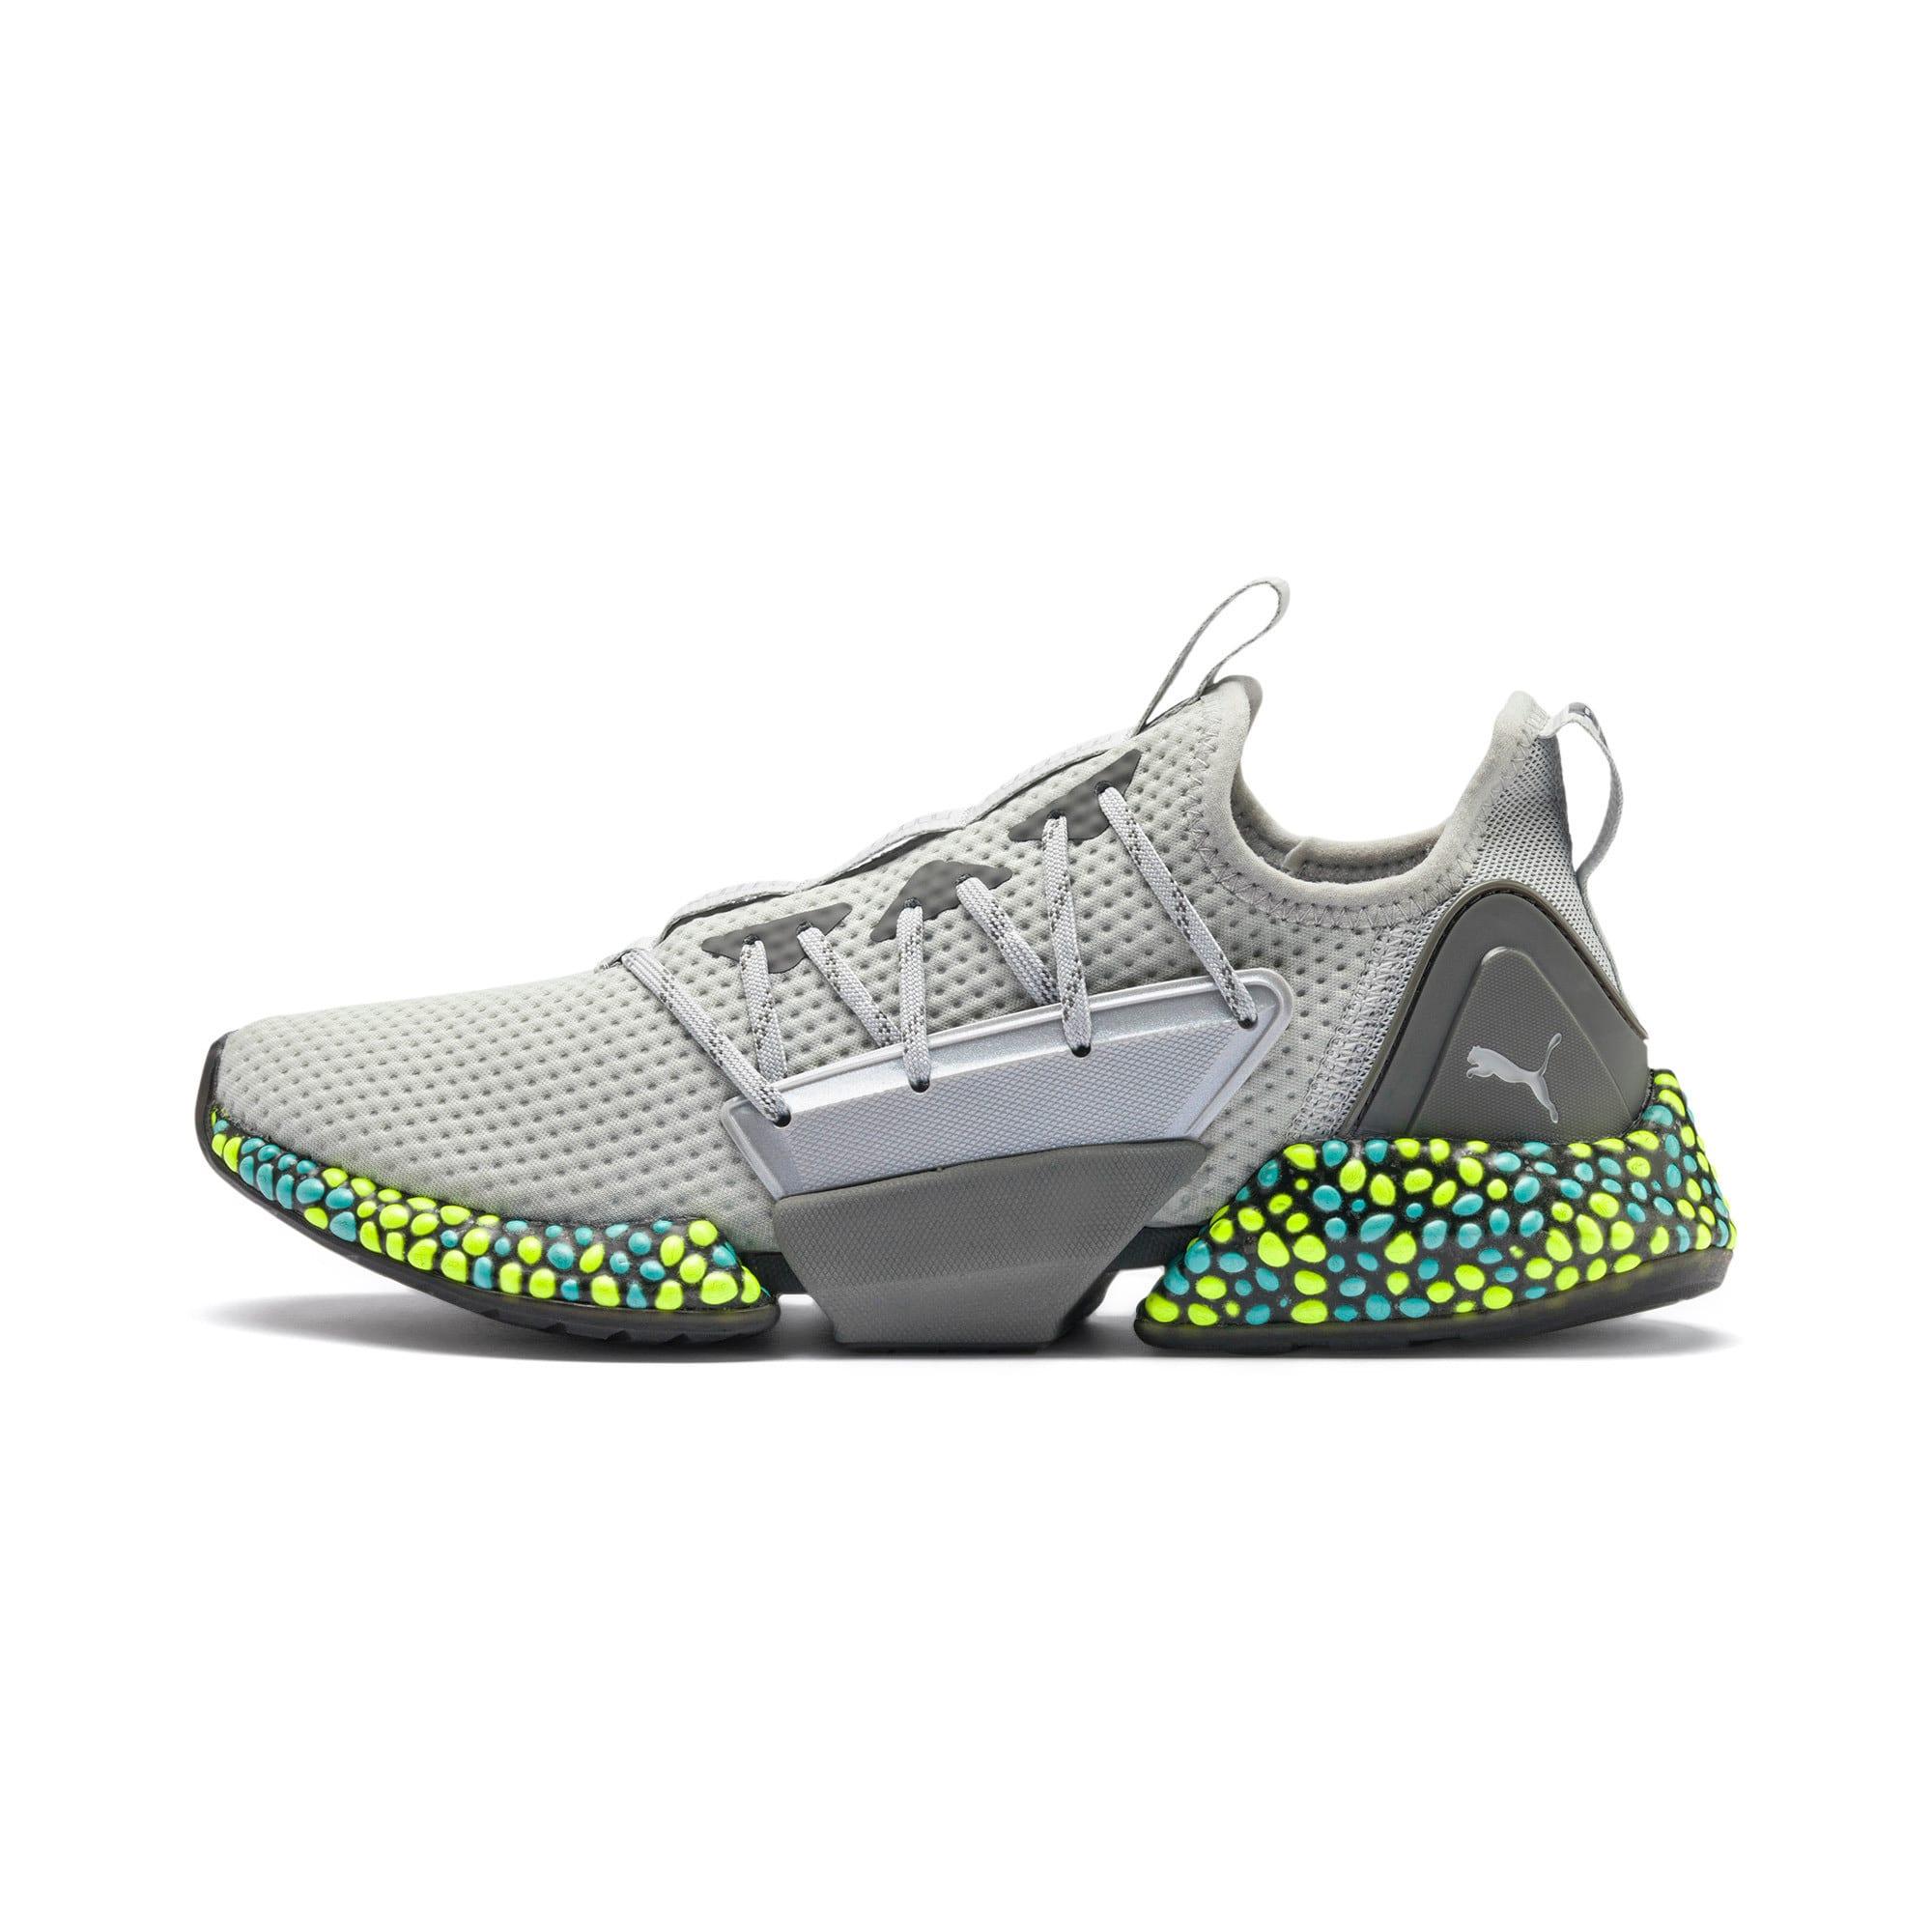 Thumbnail 1 of HYBRID Rocket Aero Men's Running Shoes, High Rise-CASTLEROCK, medium